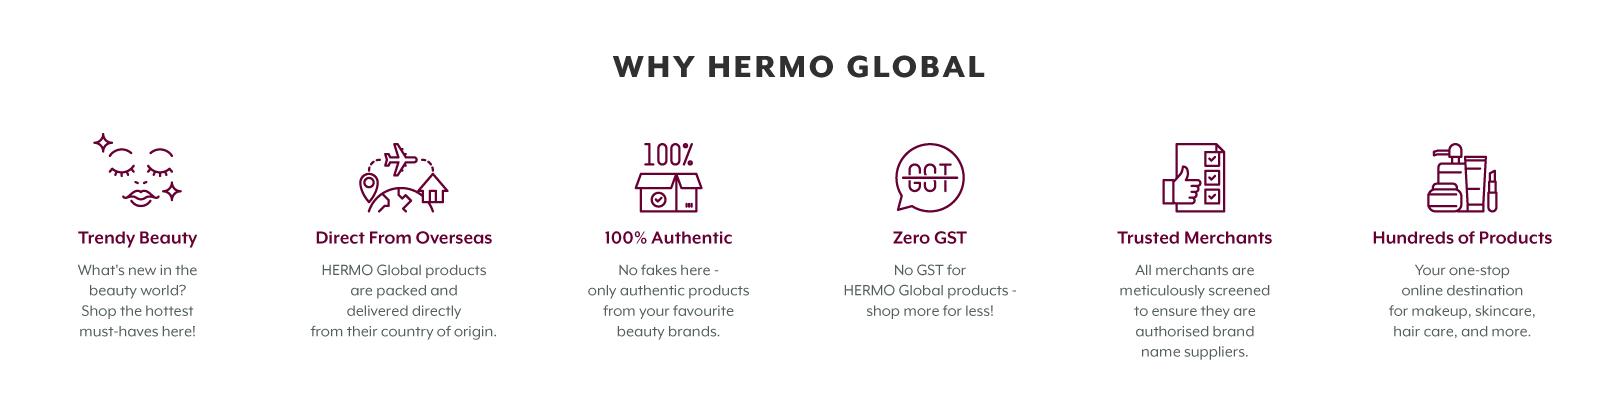 HERMO GLOBAL USP BANNER